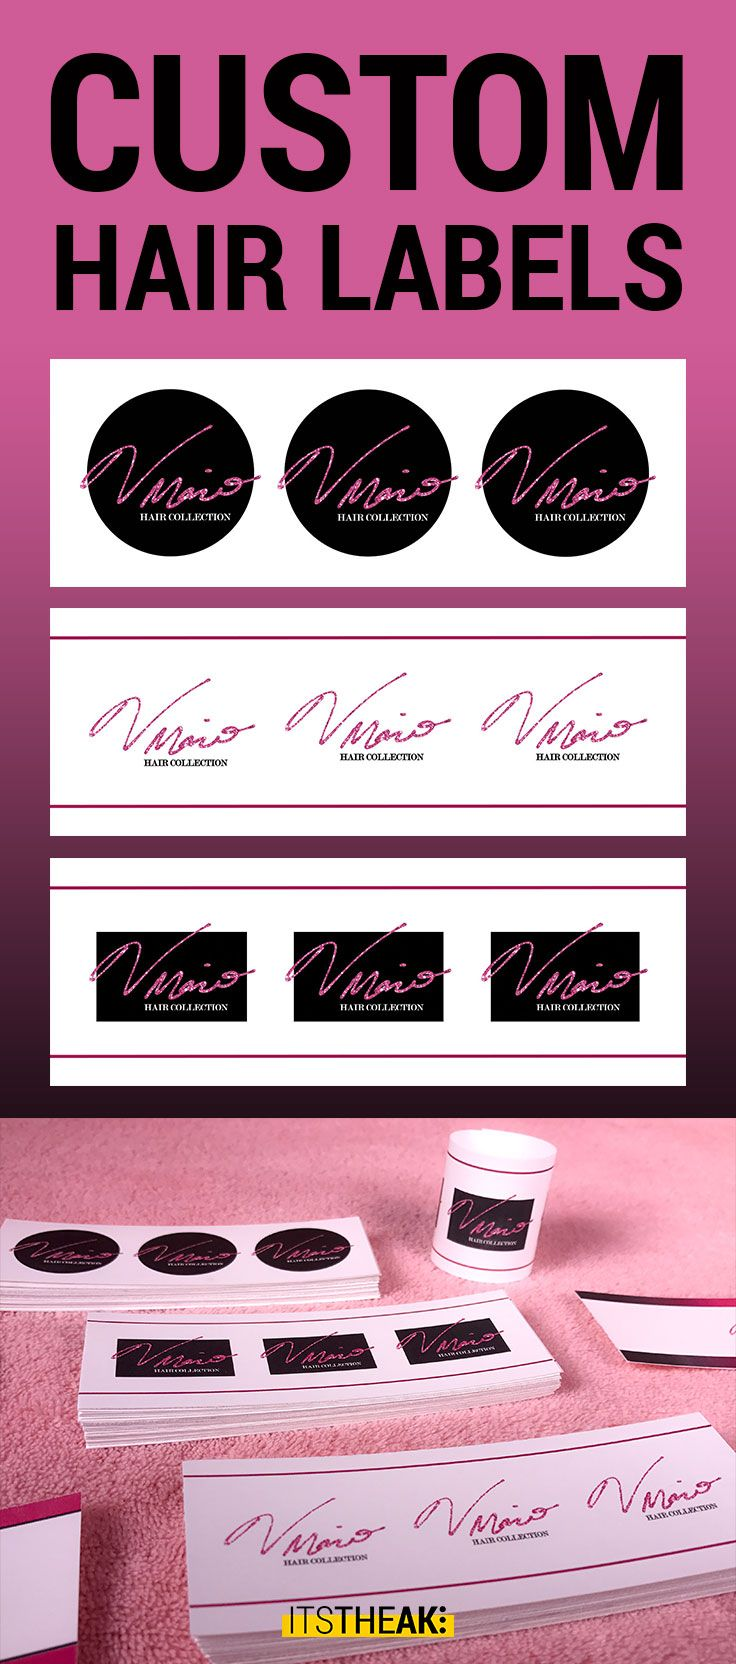 Bundle Wraps (NonAdhesive) Customized With Your Logo